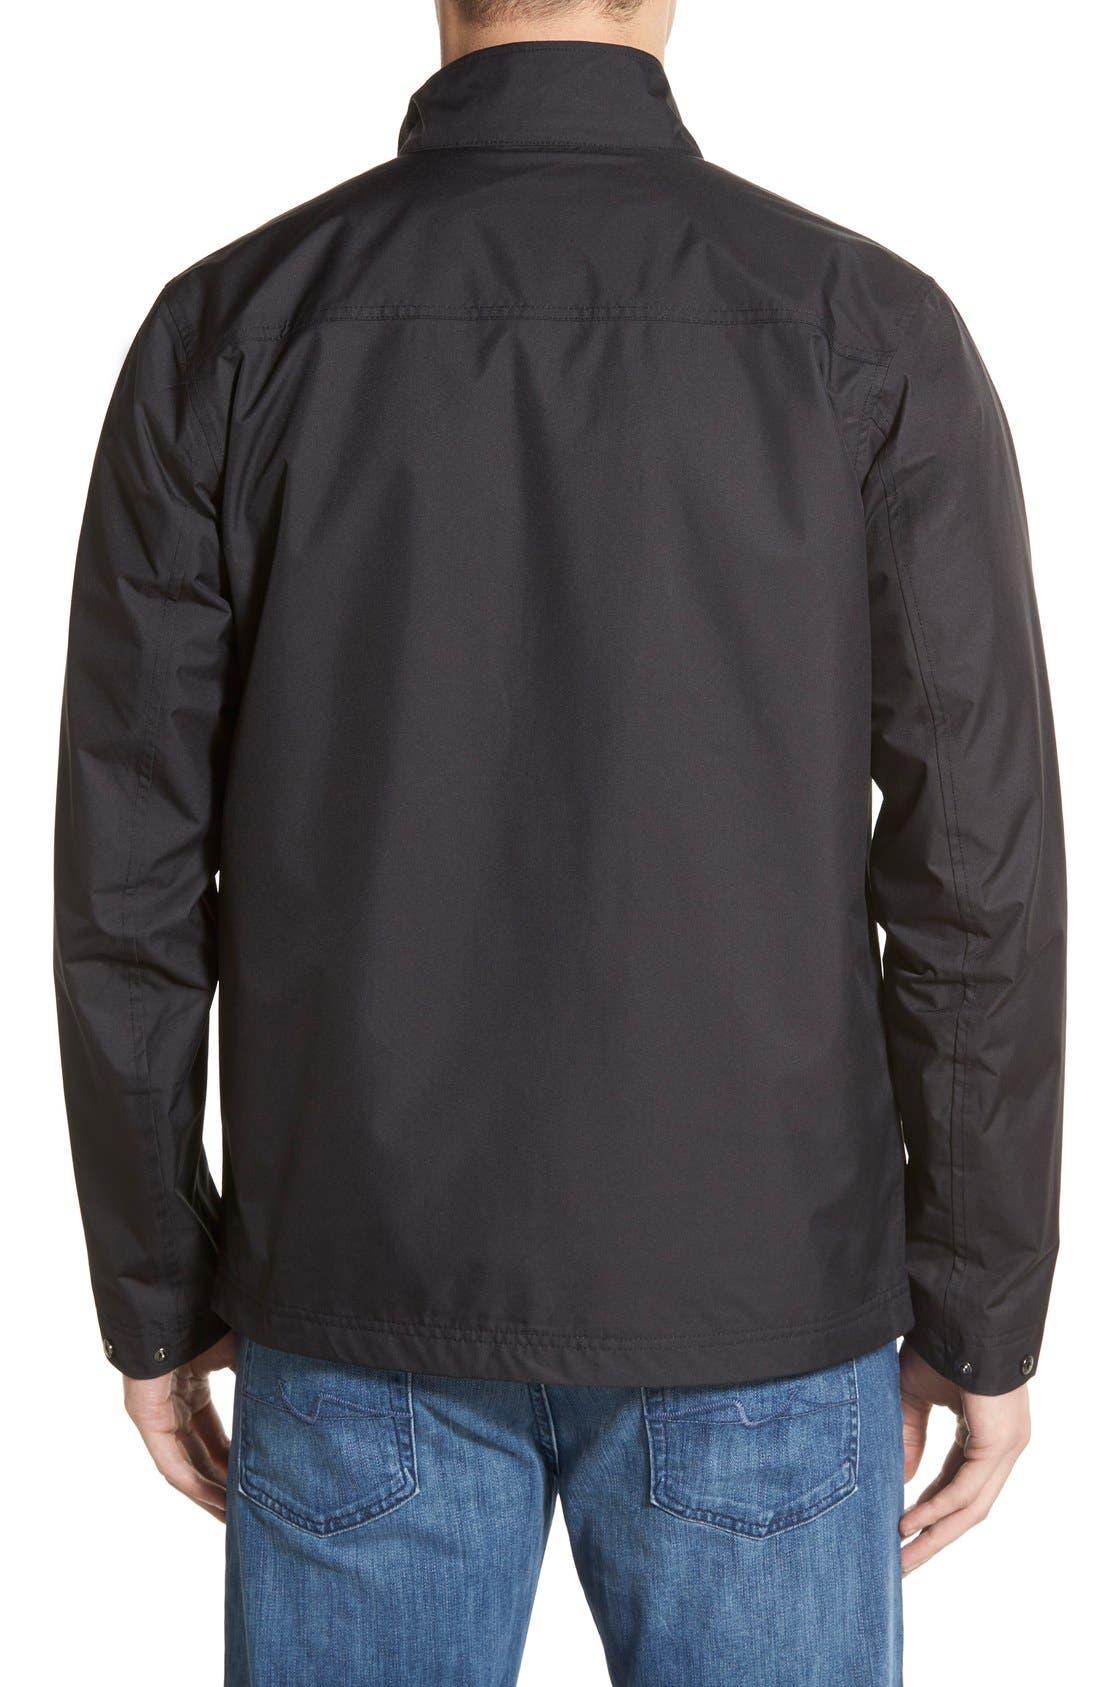 HELLY HANSEN,                             'Derry' Waterproof Jacket,                             Alternate thumbnail 4, color,                             009